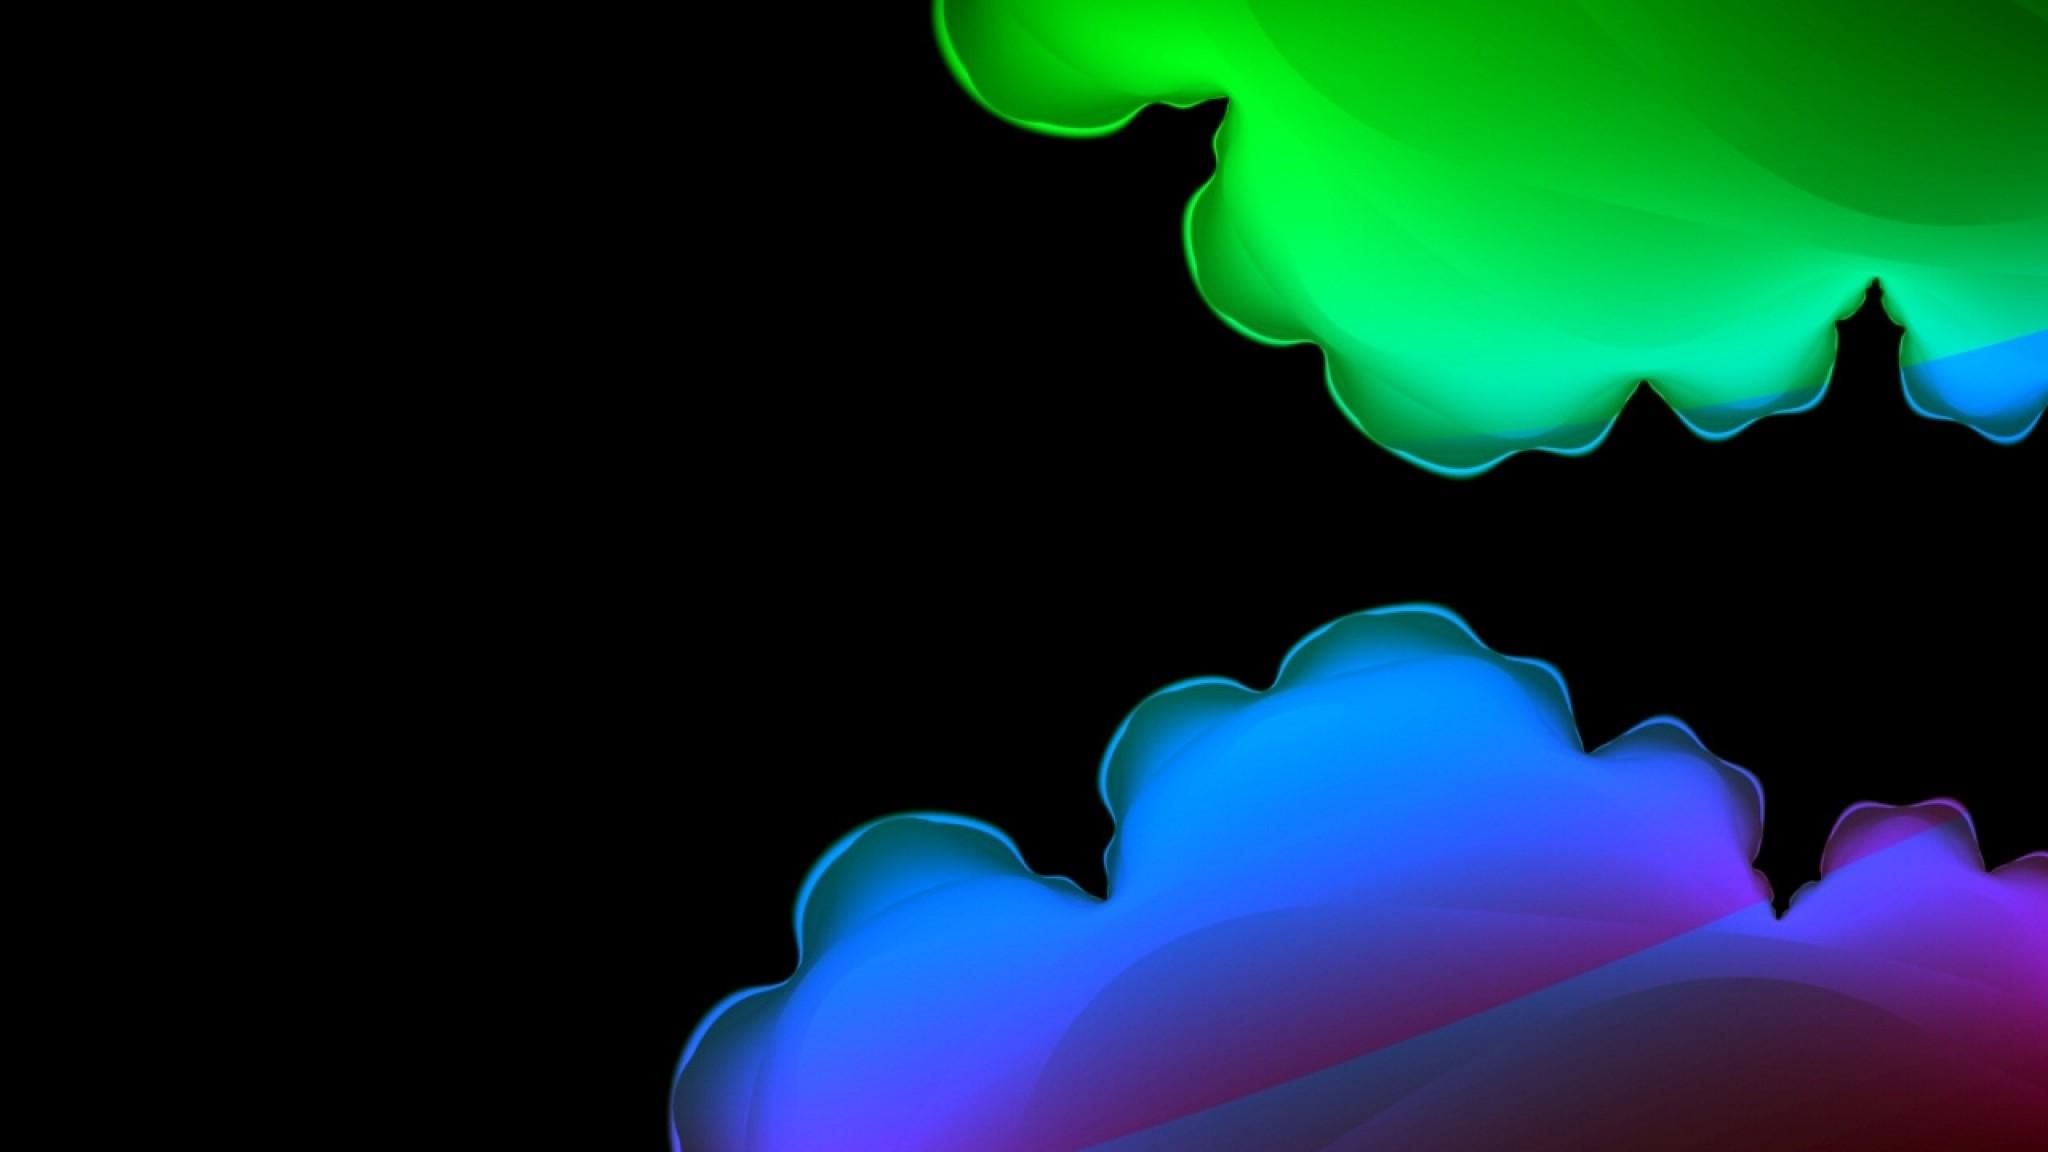 Wallpaper abstract, blue, purple, green, black